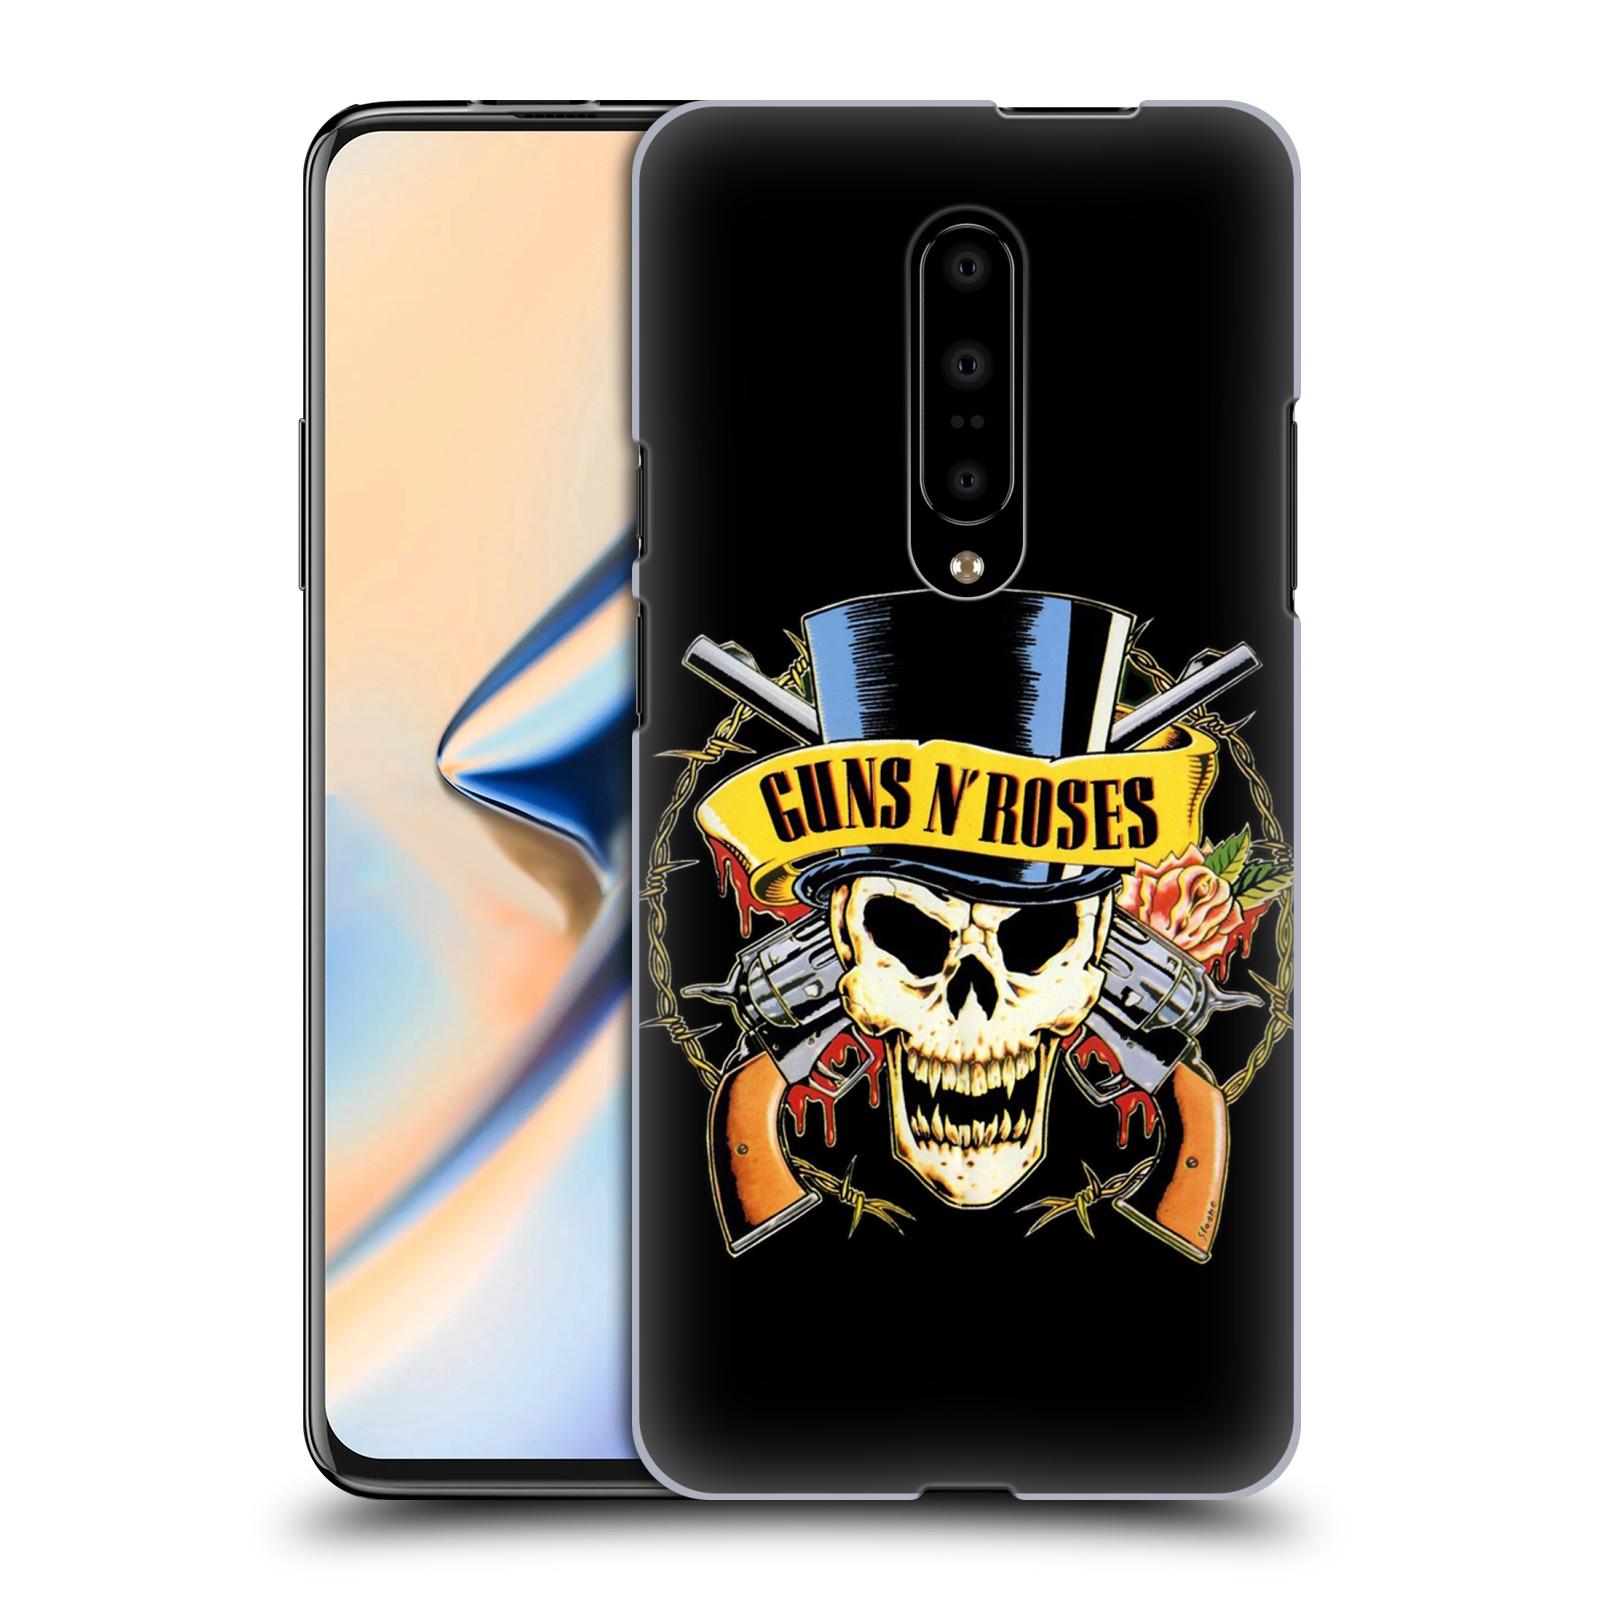 Plastové pouzdro na mobil OnePlus 7 - Head Case - Guns N' Roses - Lebka